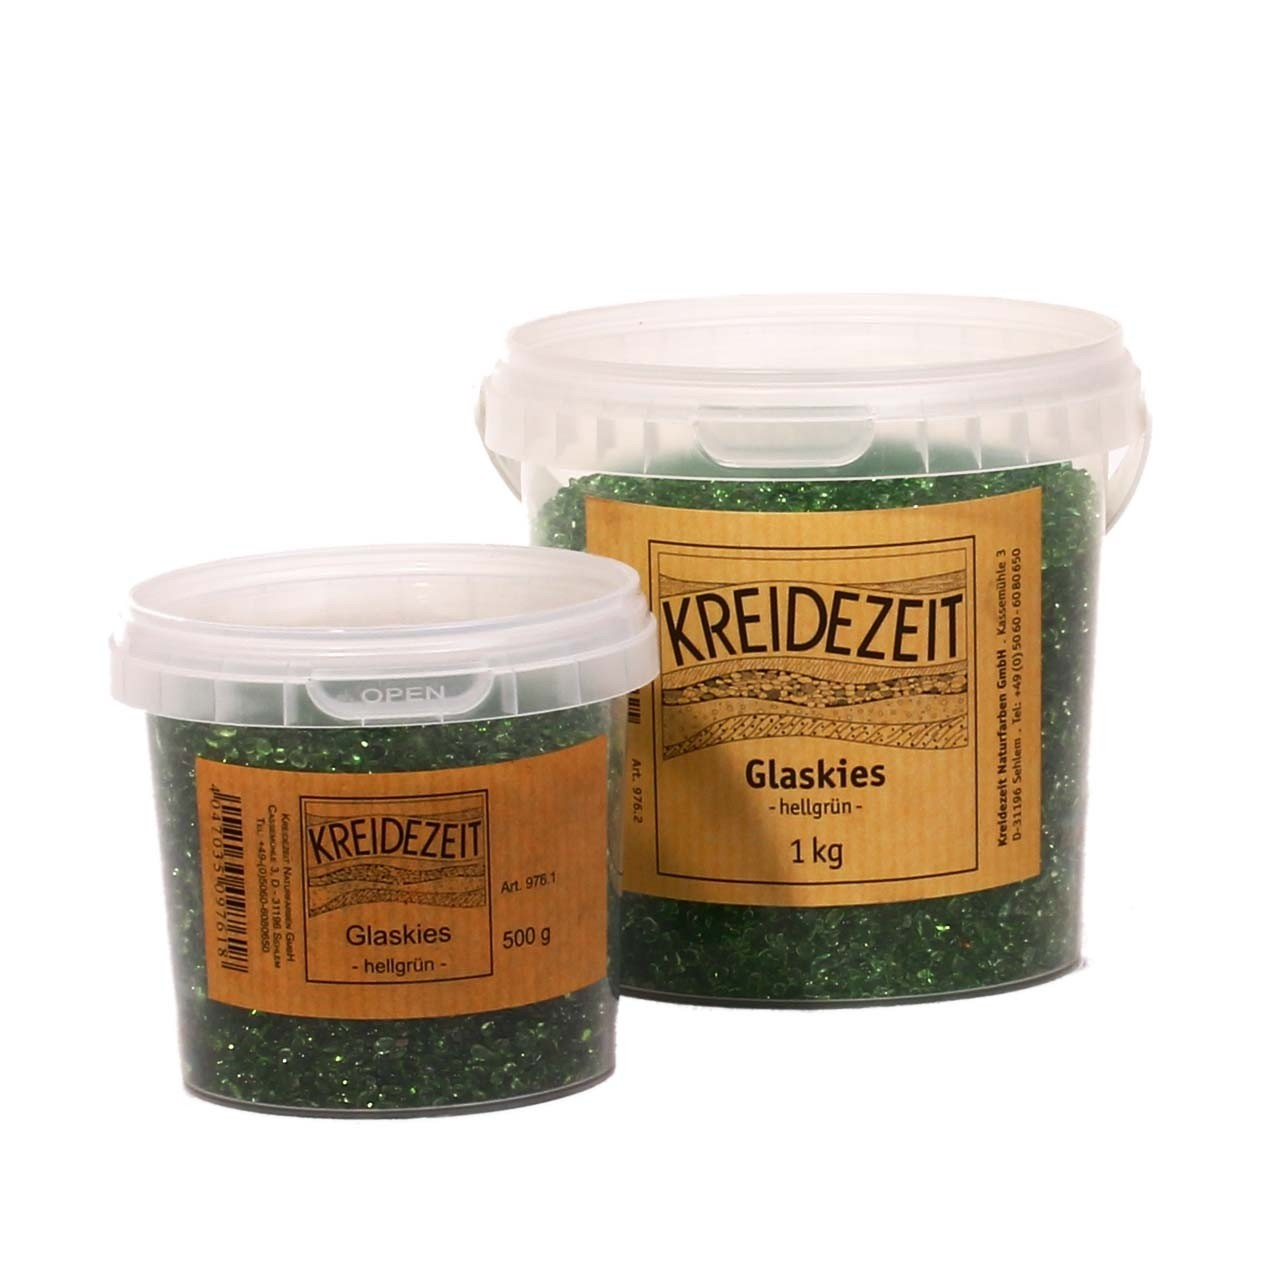 Kreidezeit Glaskies hellgrün 500g